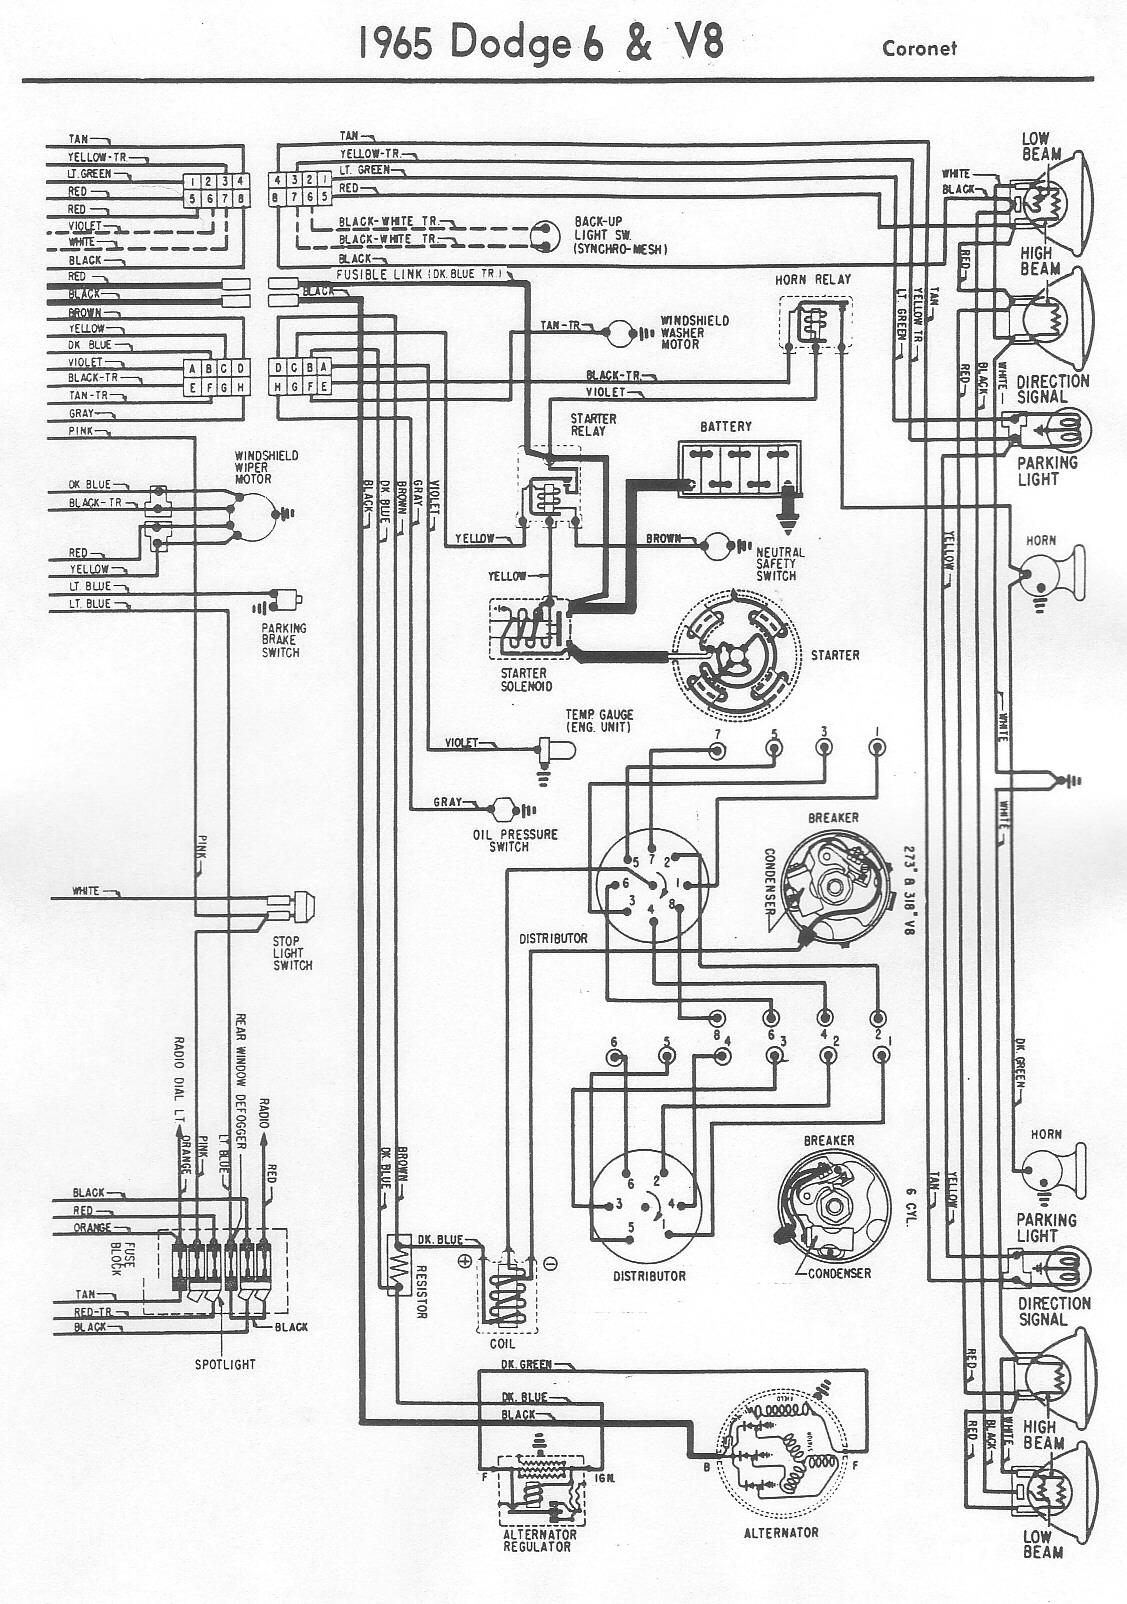 hight resolution of 1965 coronet wiring harness wiring library u2022 1998 dodge truck wiring diagram 1960 dodge wiring